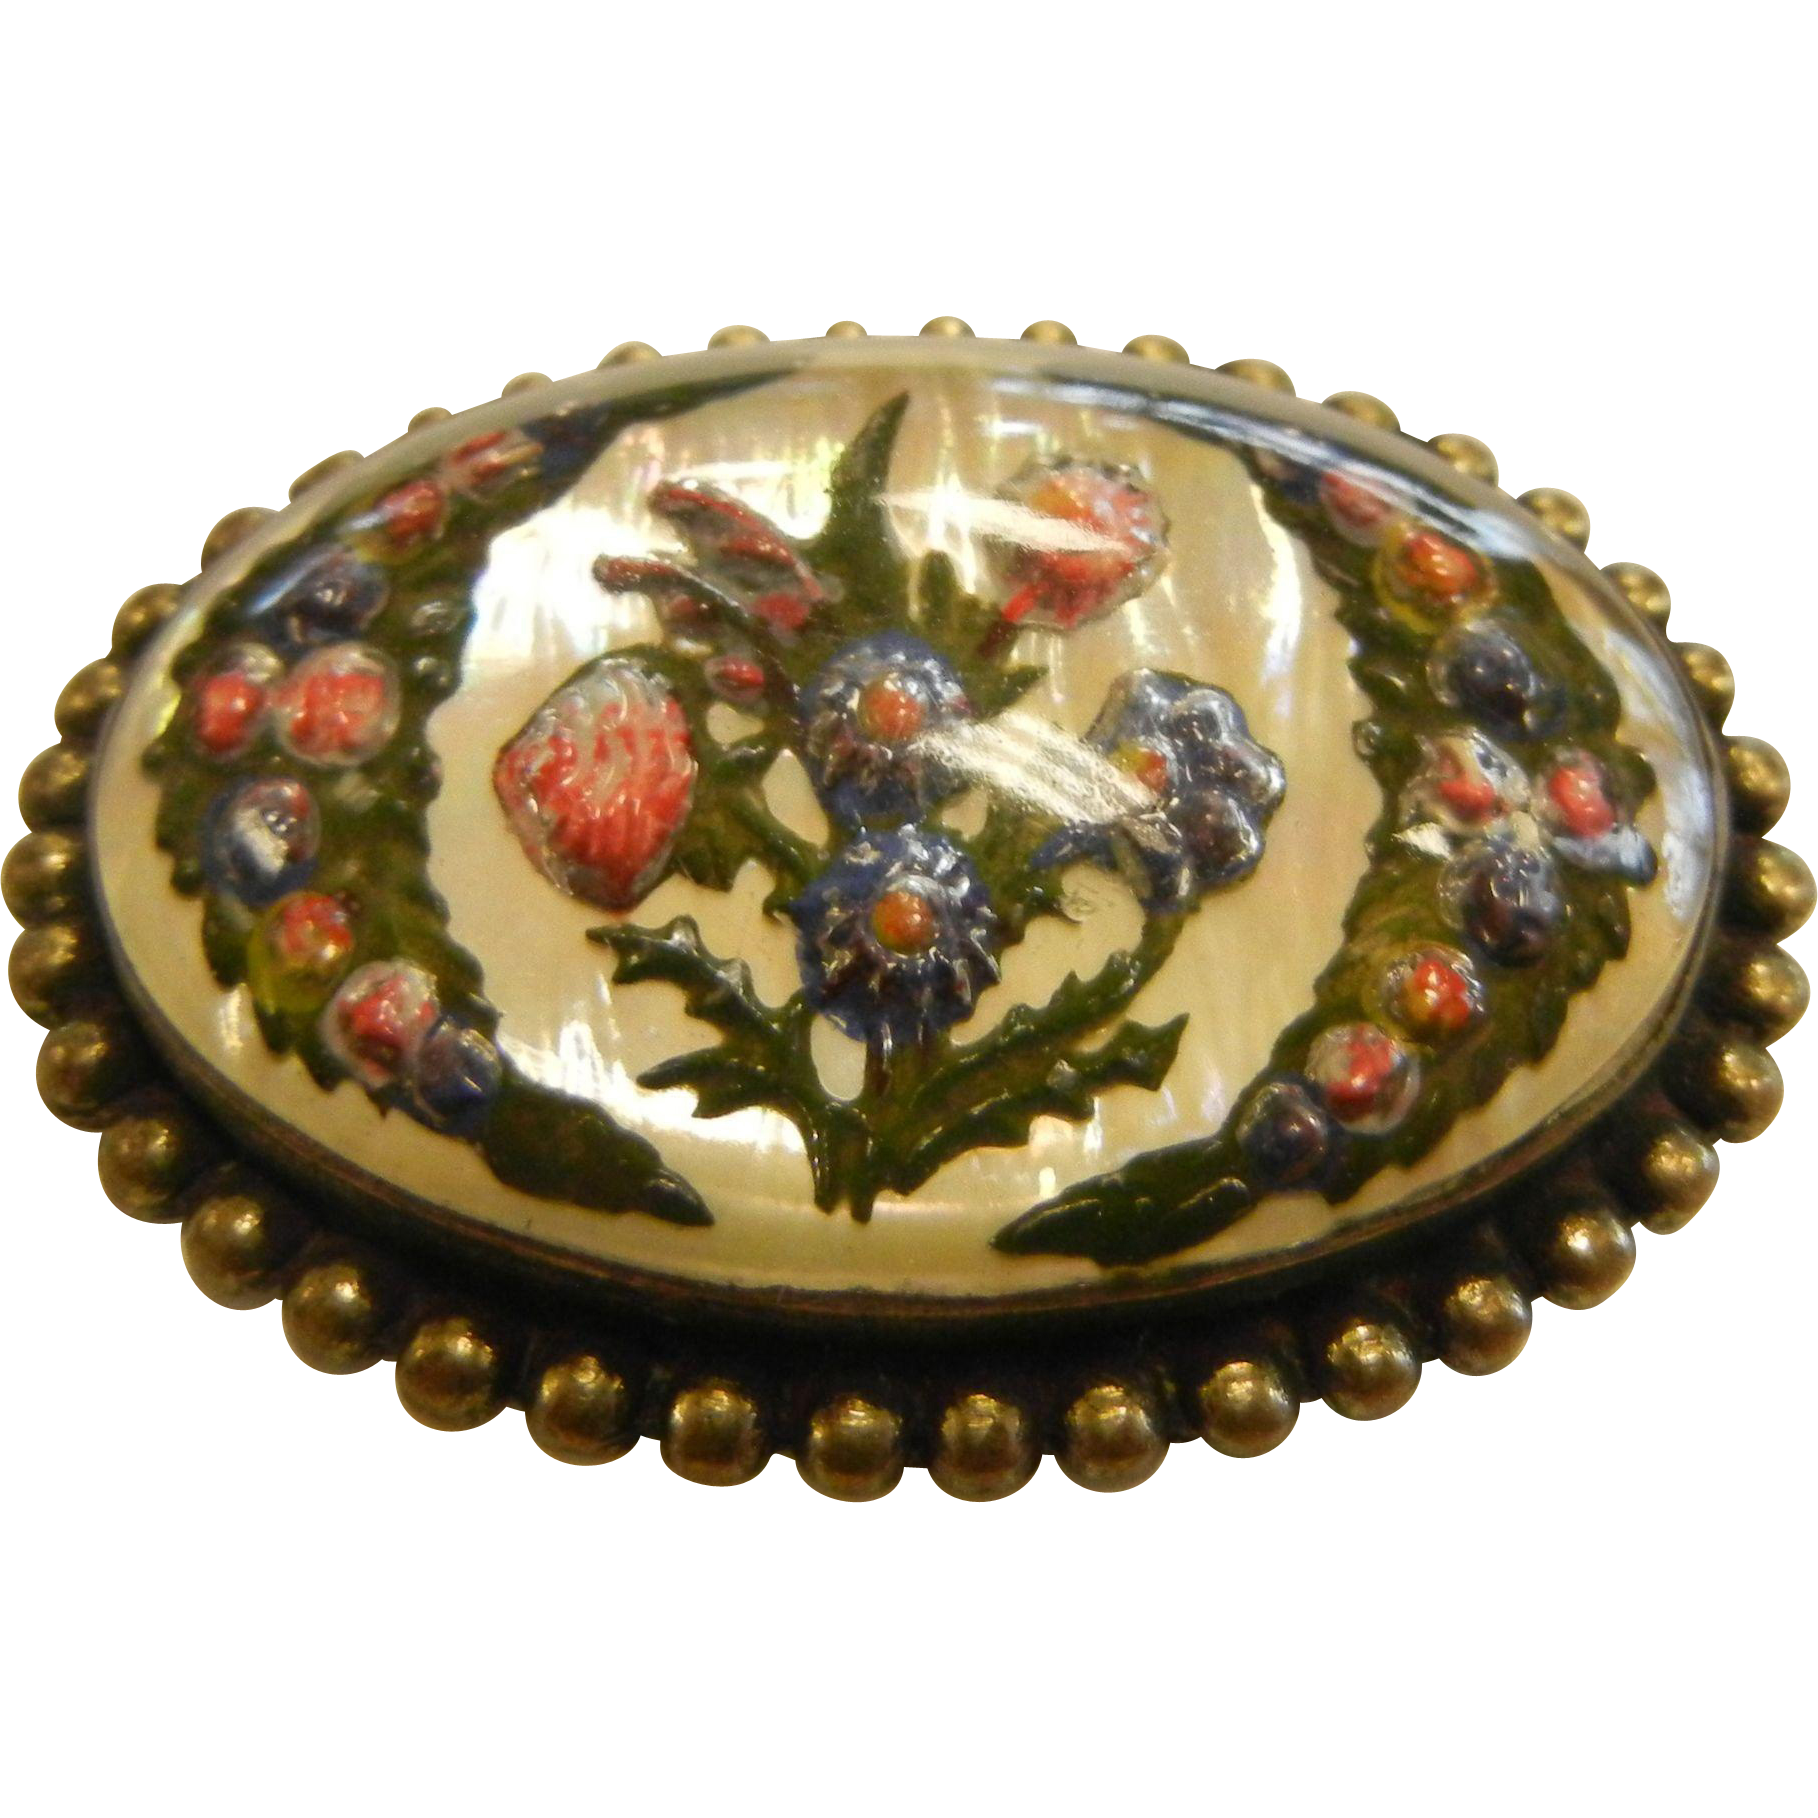 Vintage Goofus Intaglio Glass Brooch w/ Floral Designs